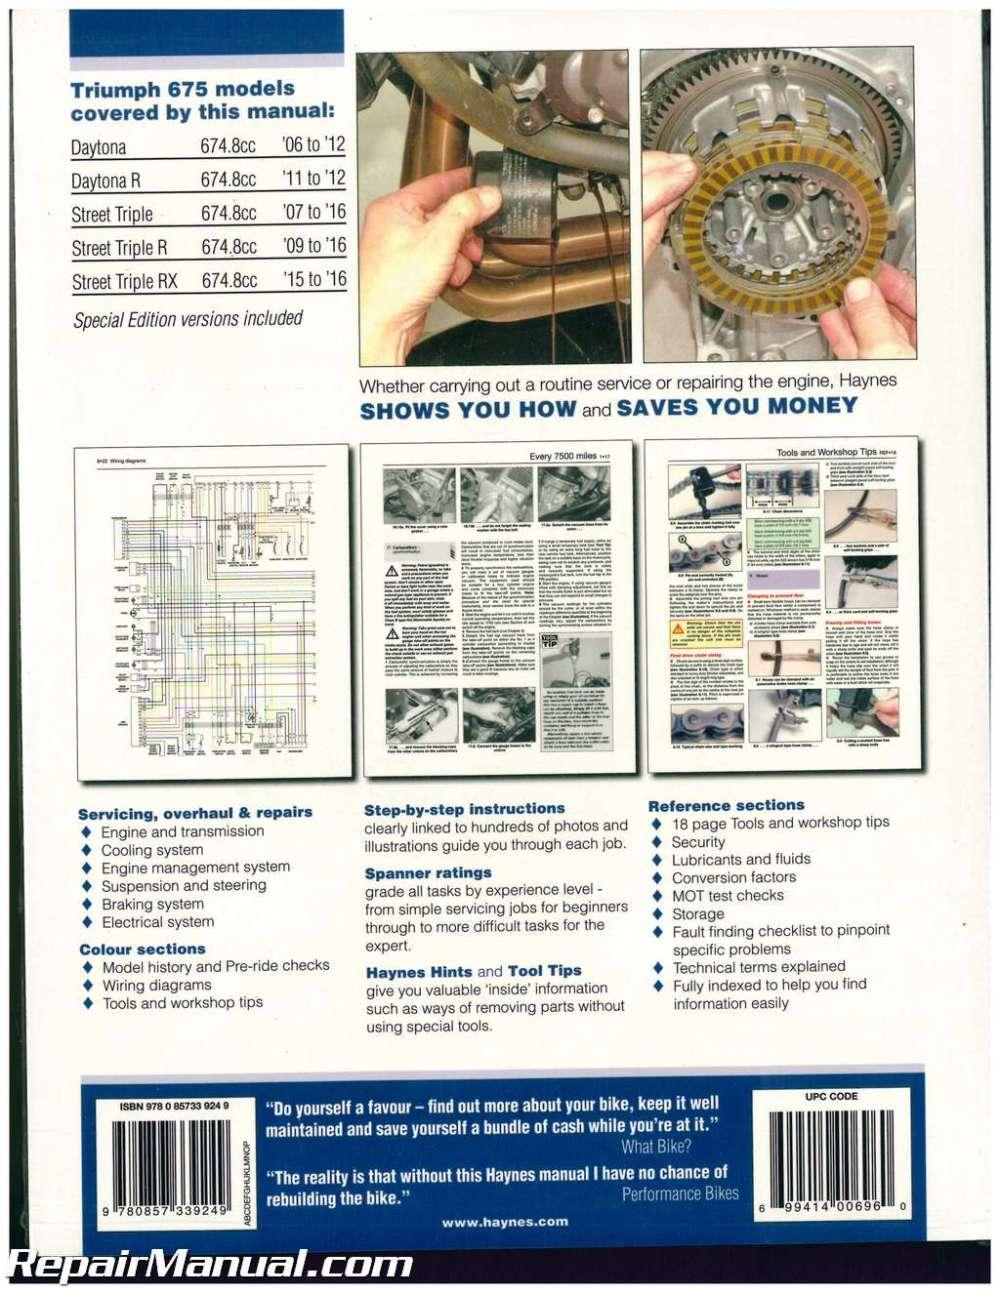 medium resolution of haynes triumph 675 daytona 2006 2012 street triple 2007 2016 motorcycle repair manual